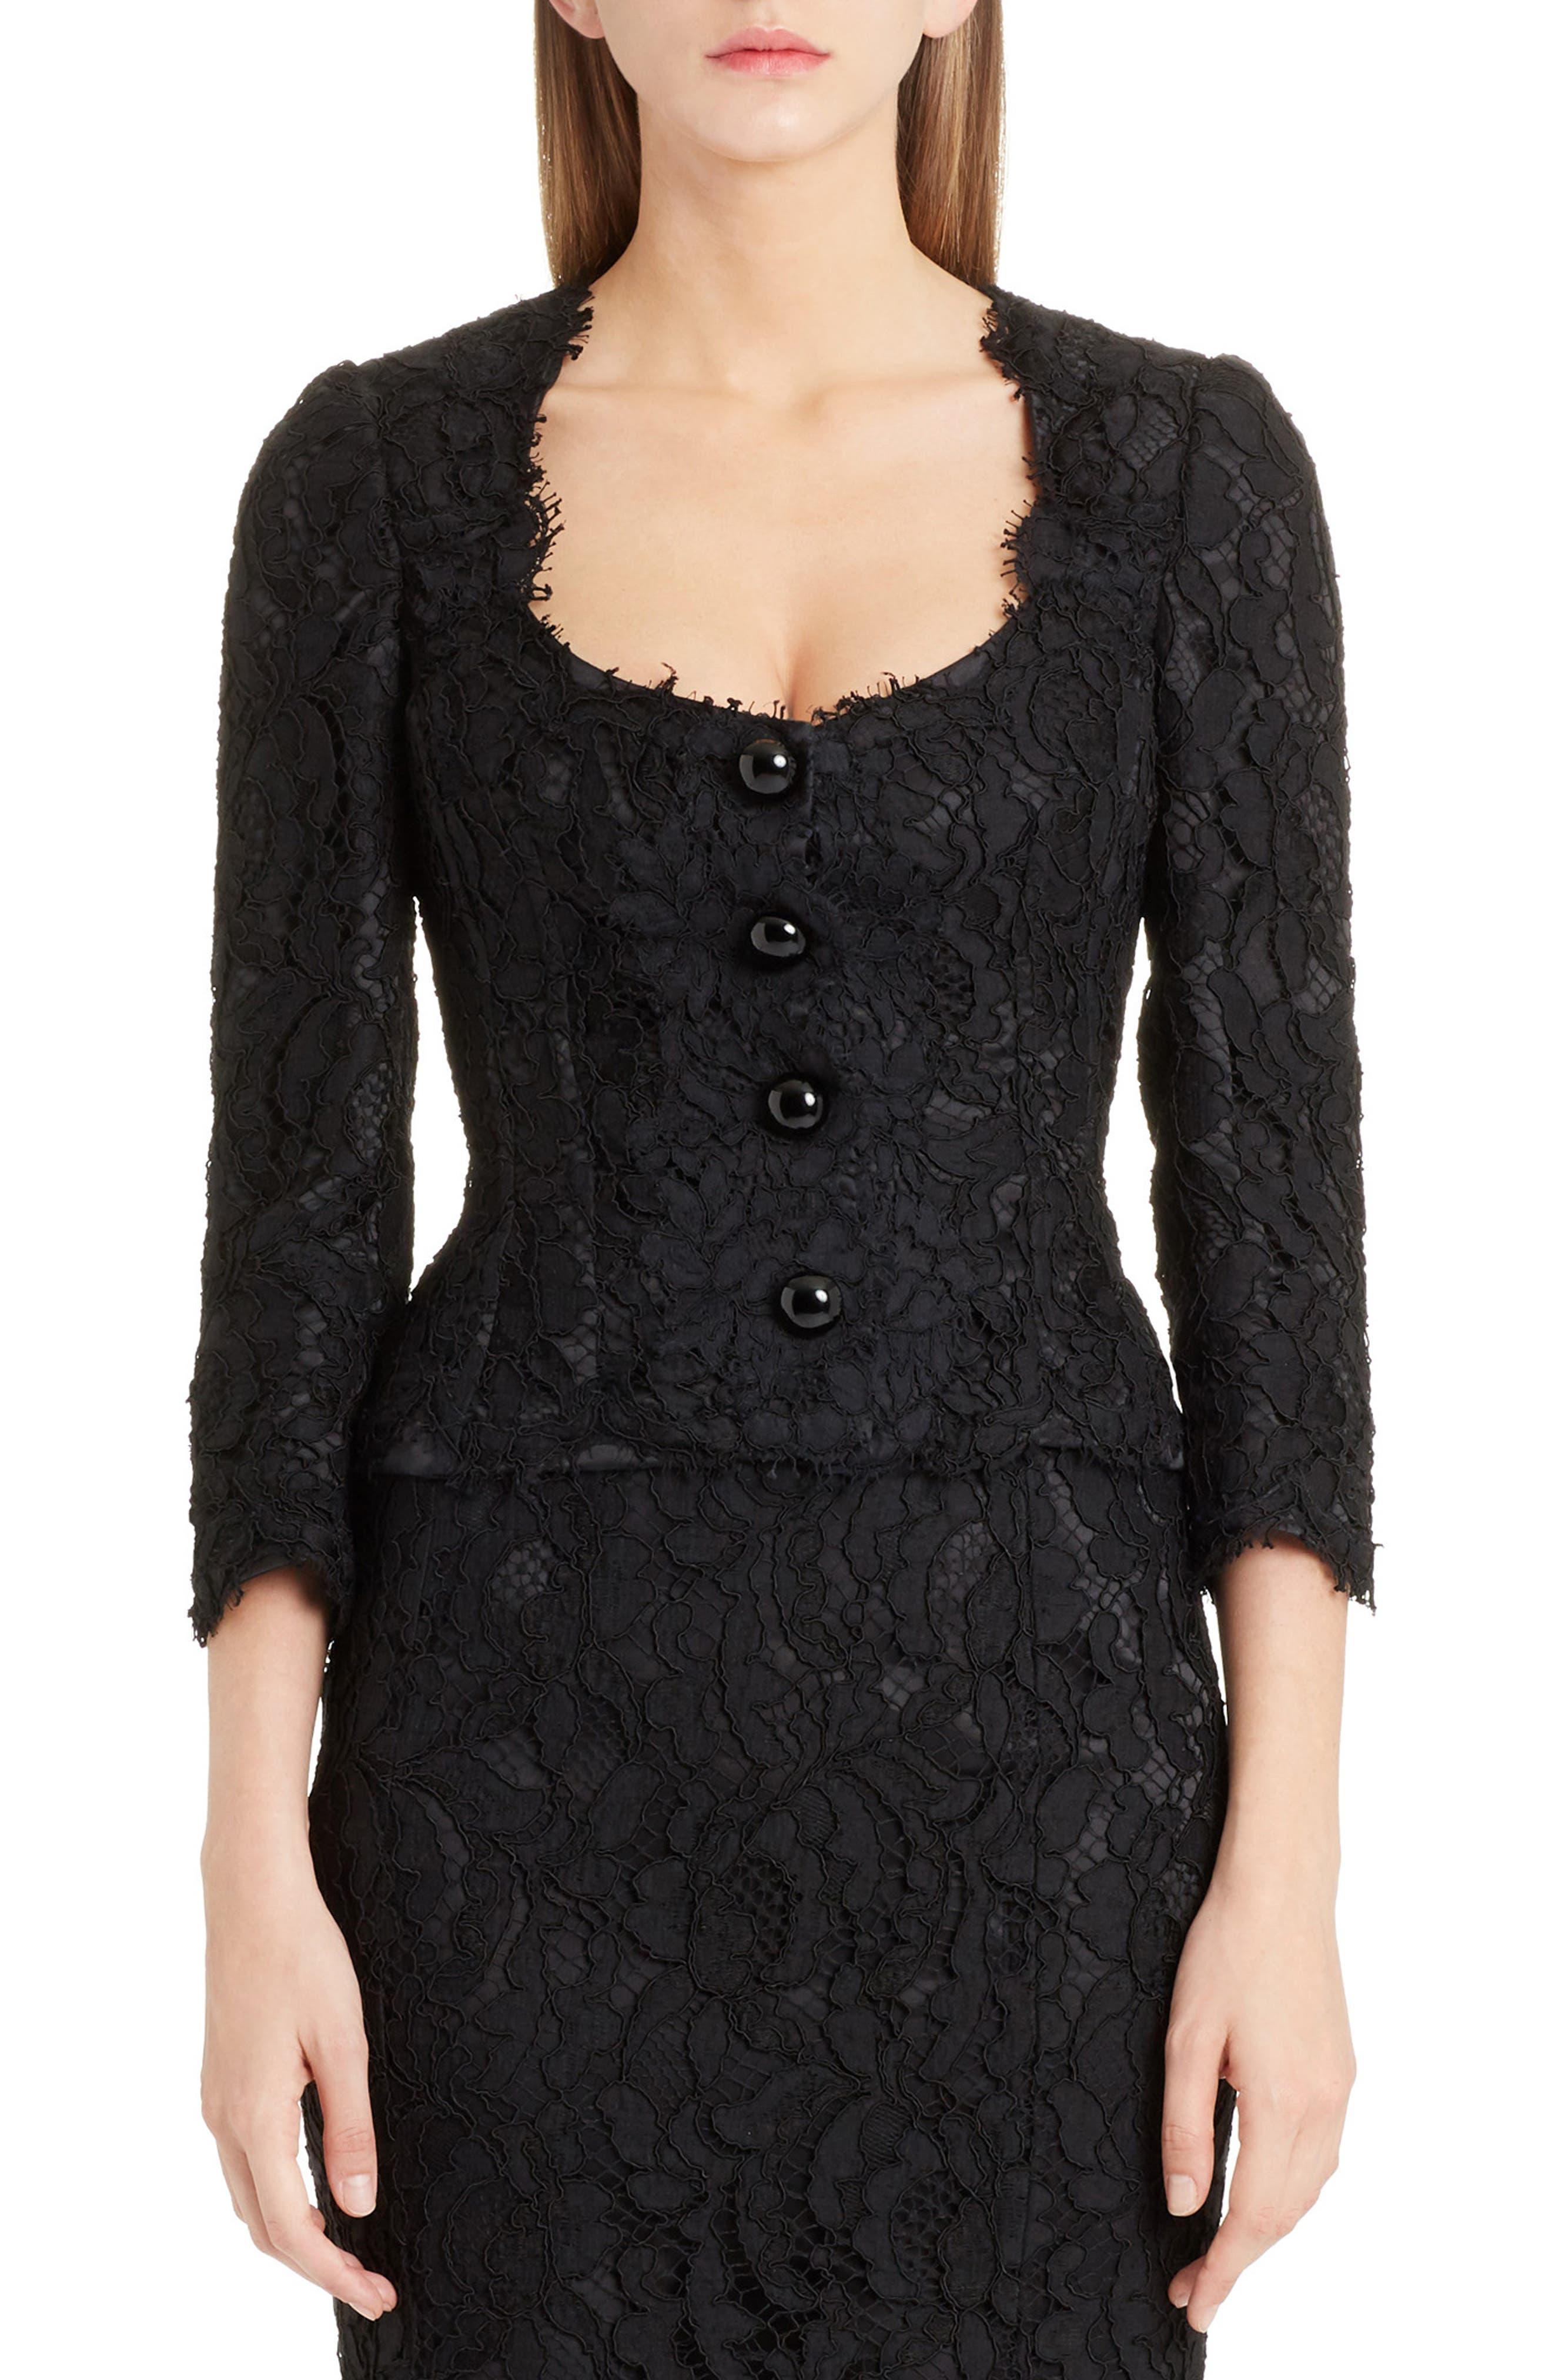 Dolce&Gabbana Lace Jacket